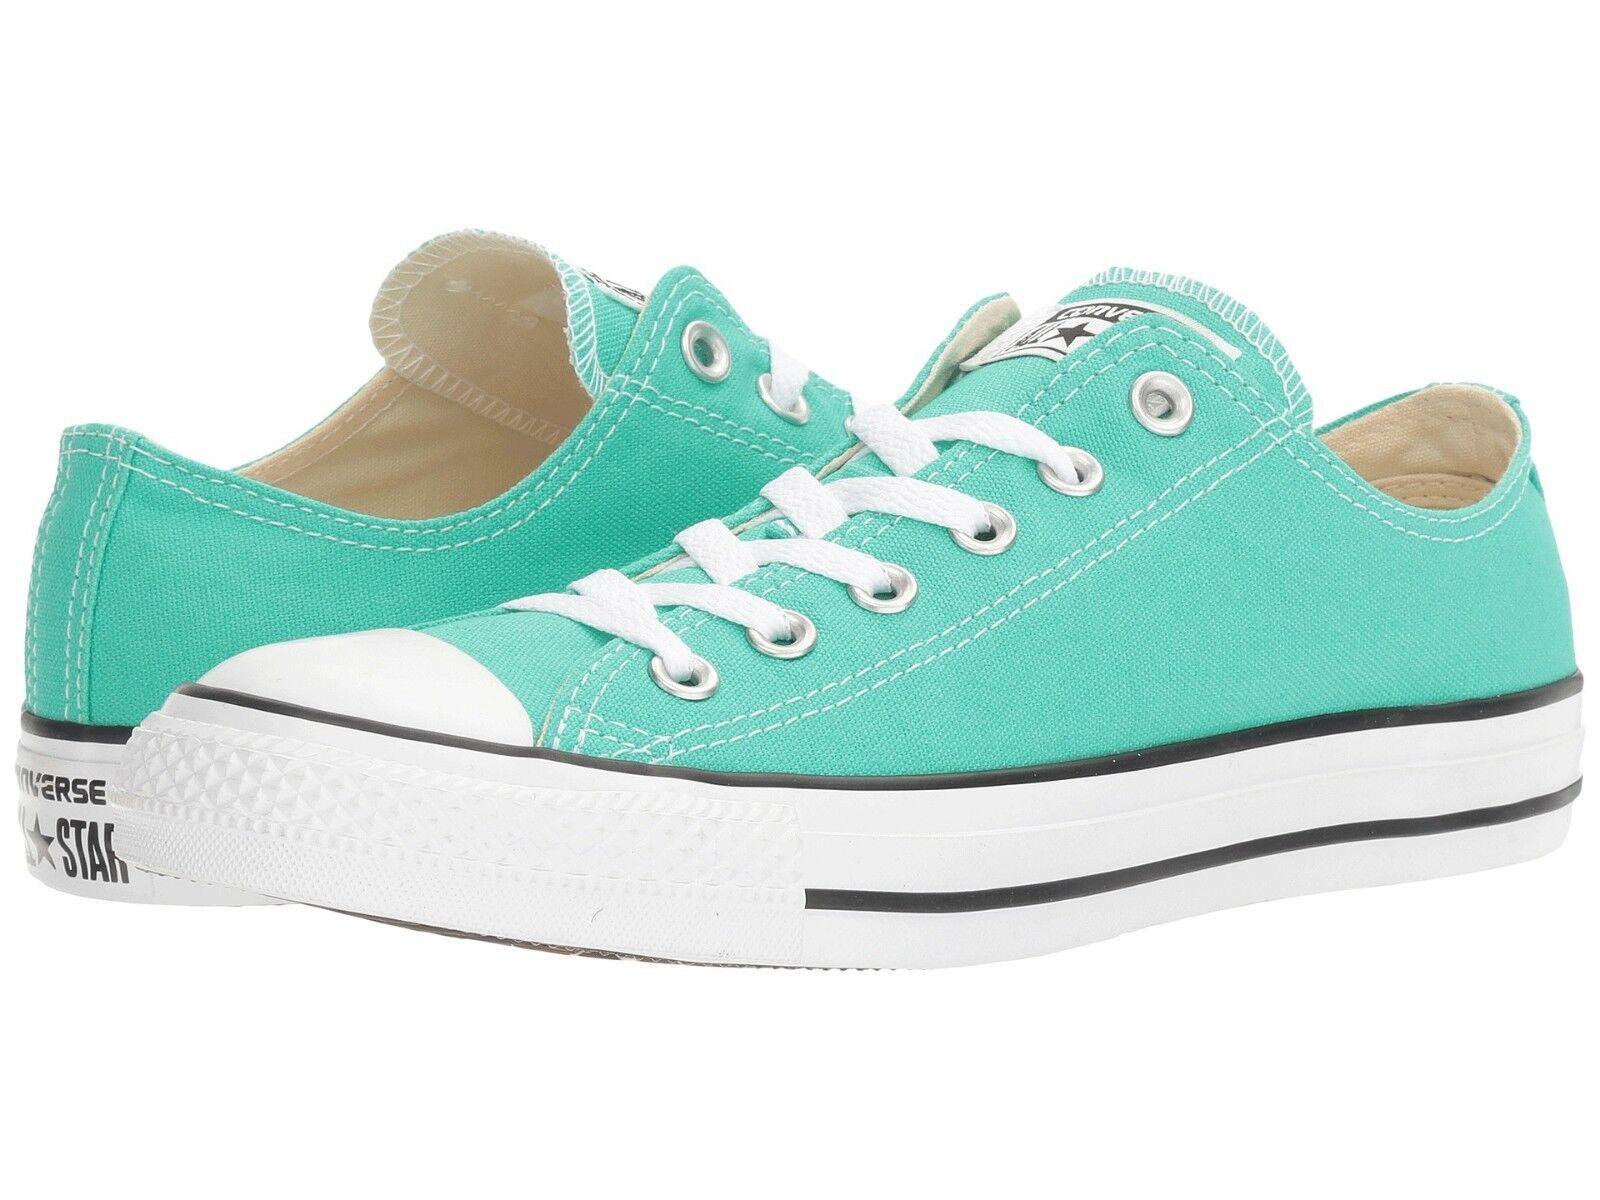 Converse - chuck taylor all - star - Converse oxford menta green (155737f) e4a3dd